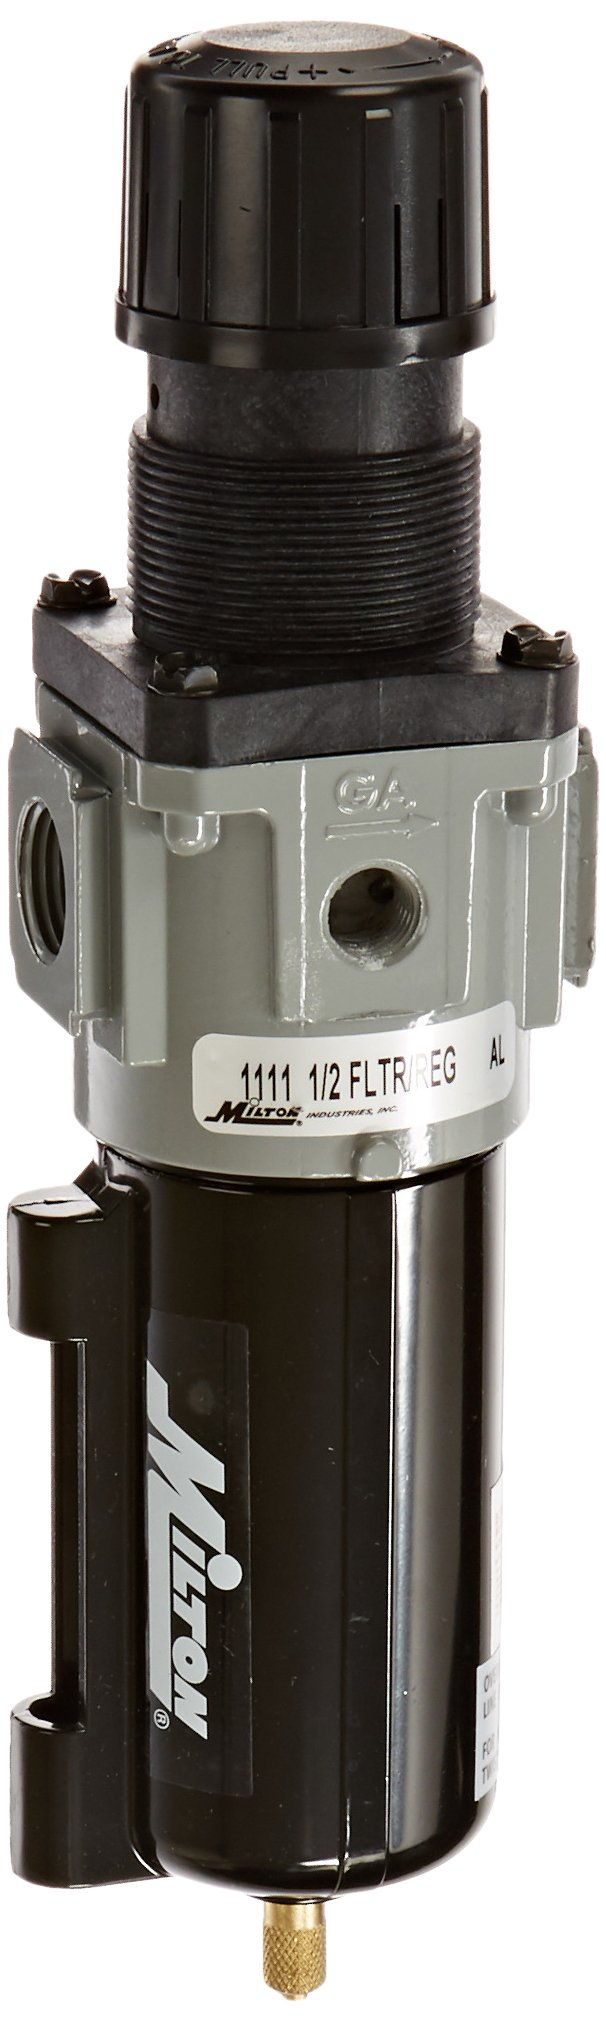 Milton 1111 1/2'' Filter and Regulator Piggyback by Milton Industries